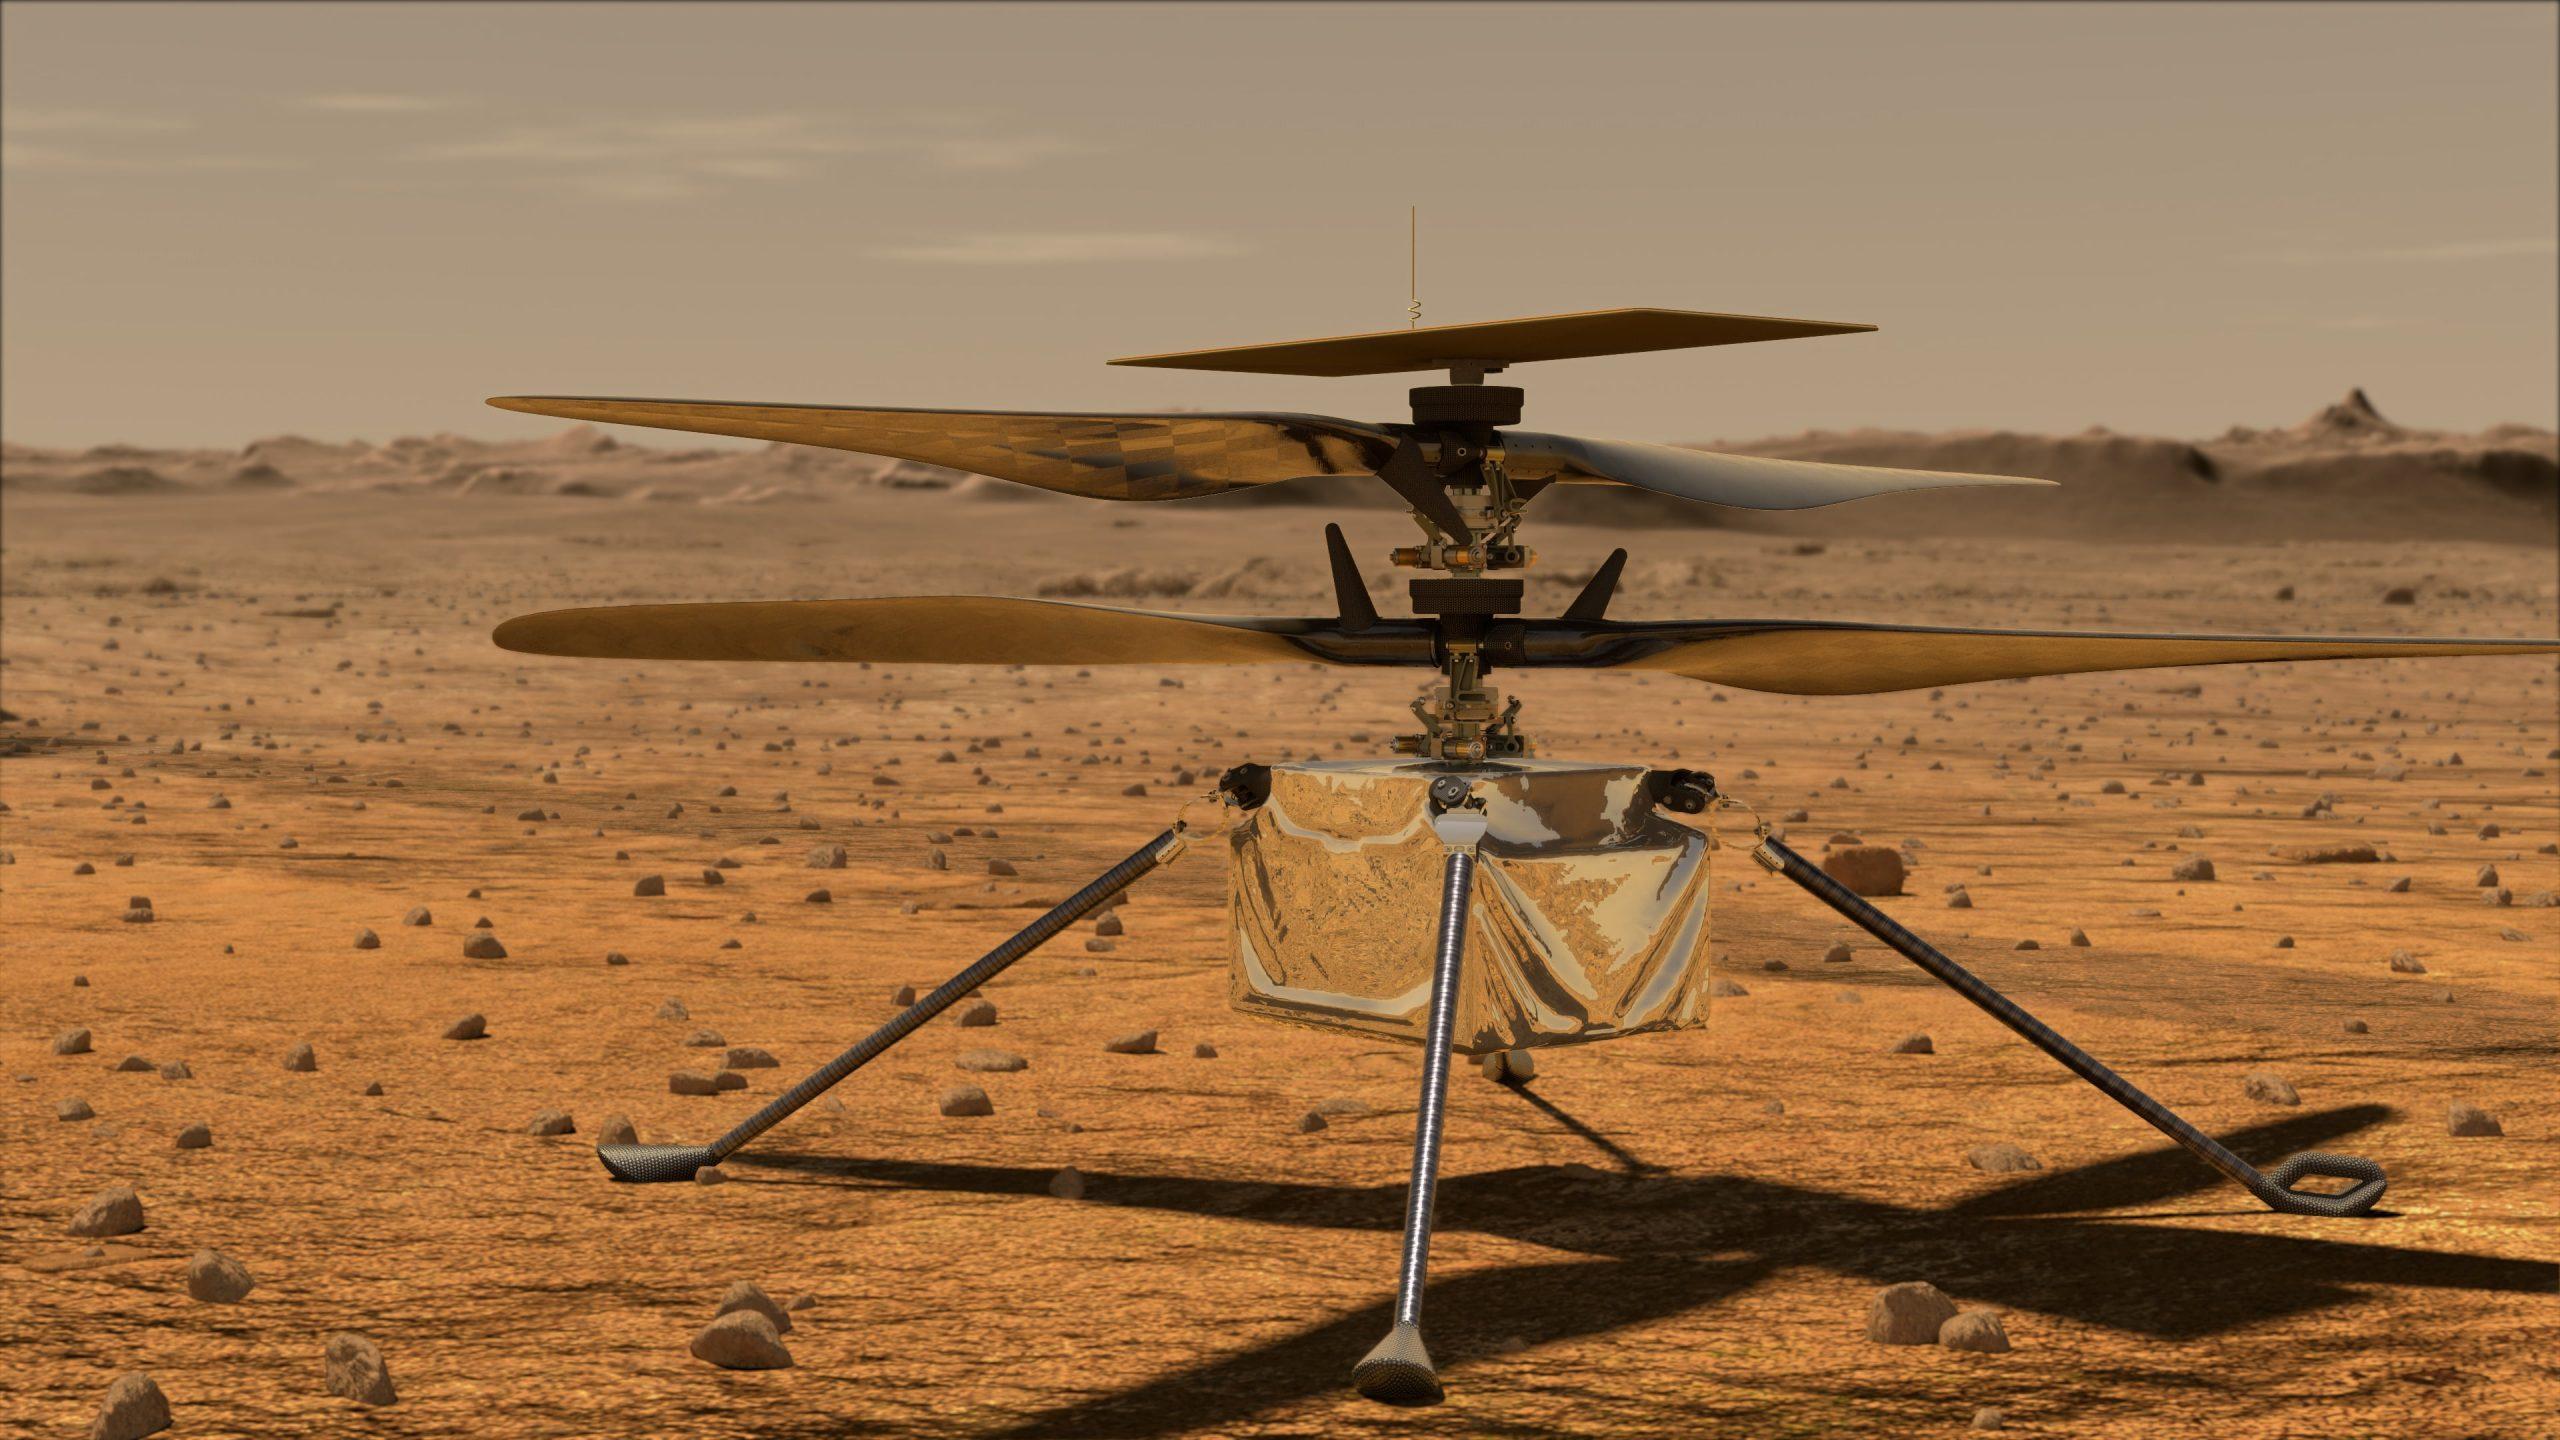 ingenuity-helicopter-mars-min